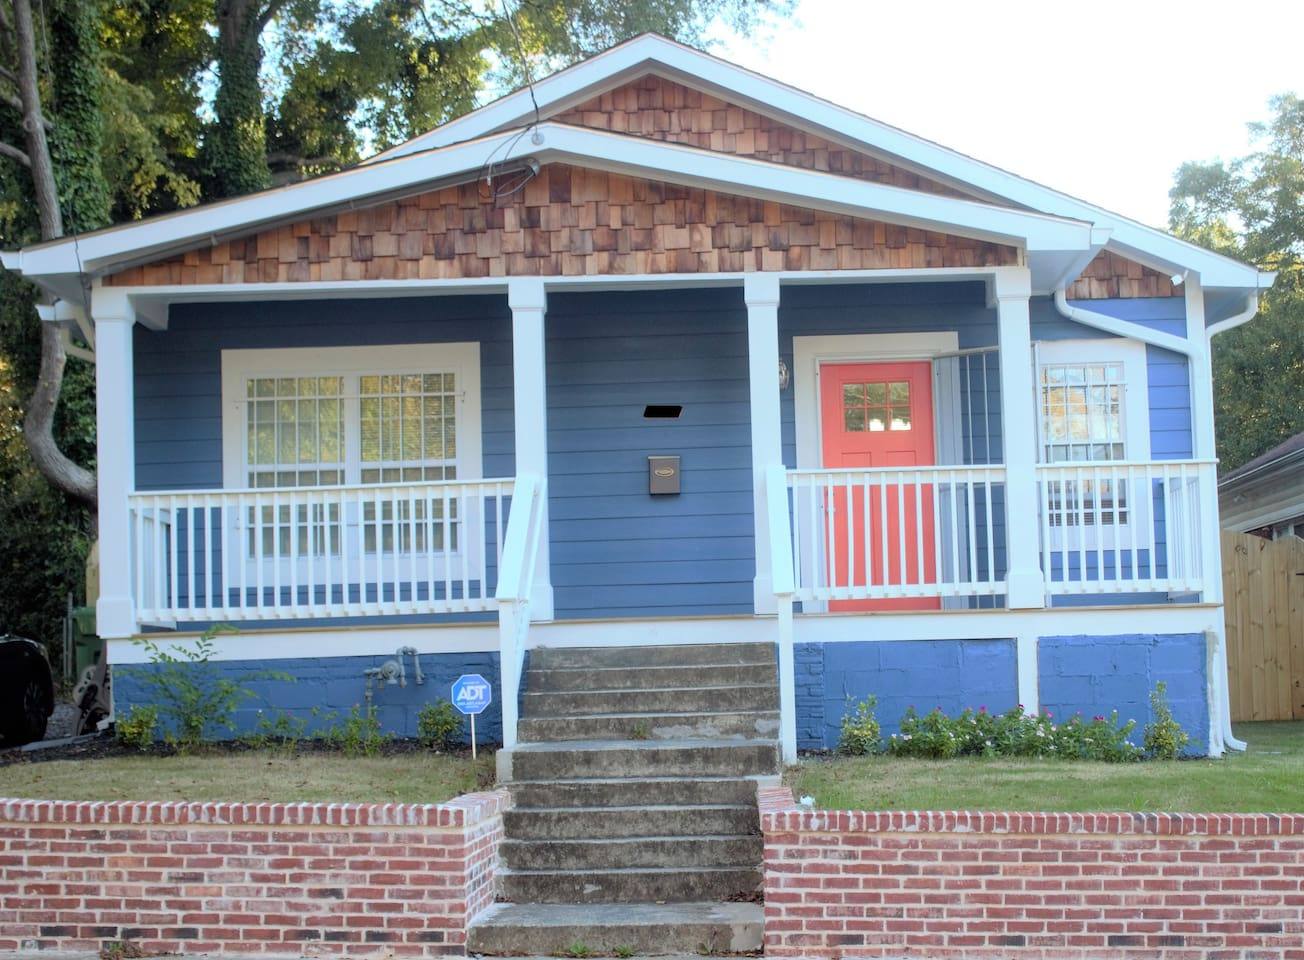 Gorgeous blue home with pumpkin door!